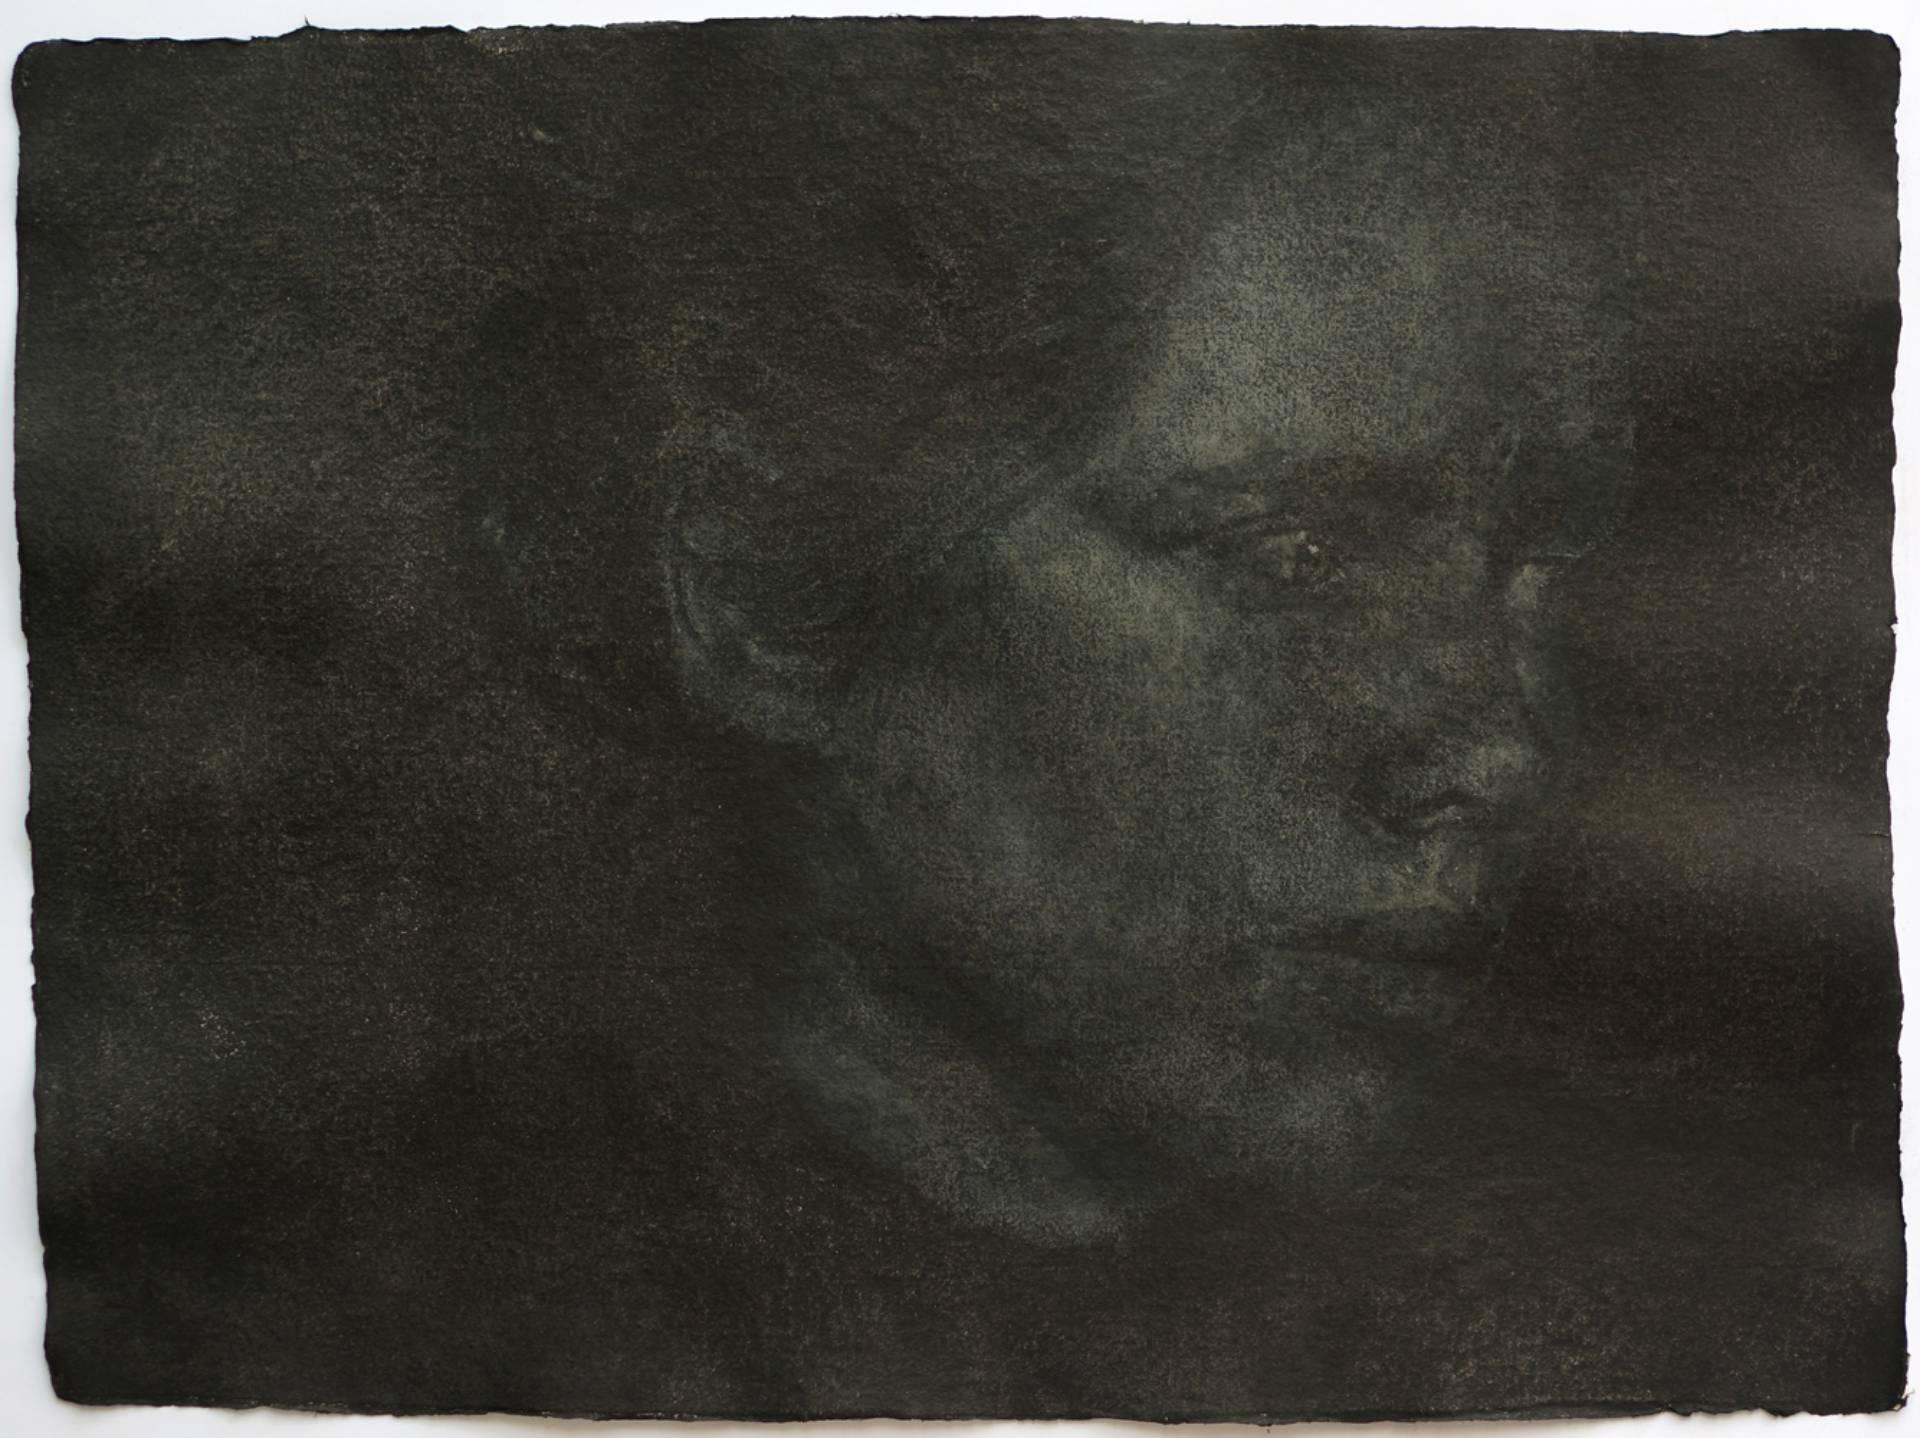 Vargtimmen no.6, 56x76 cm, Oil on handmade paper, 2015